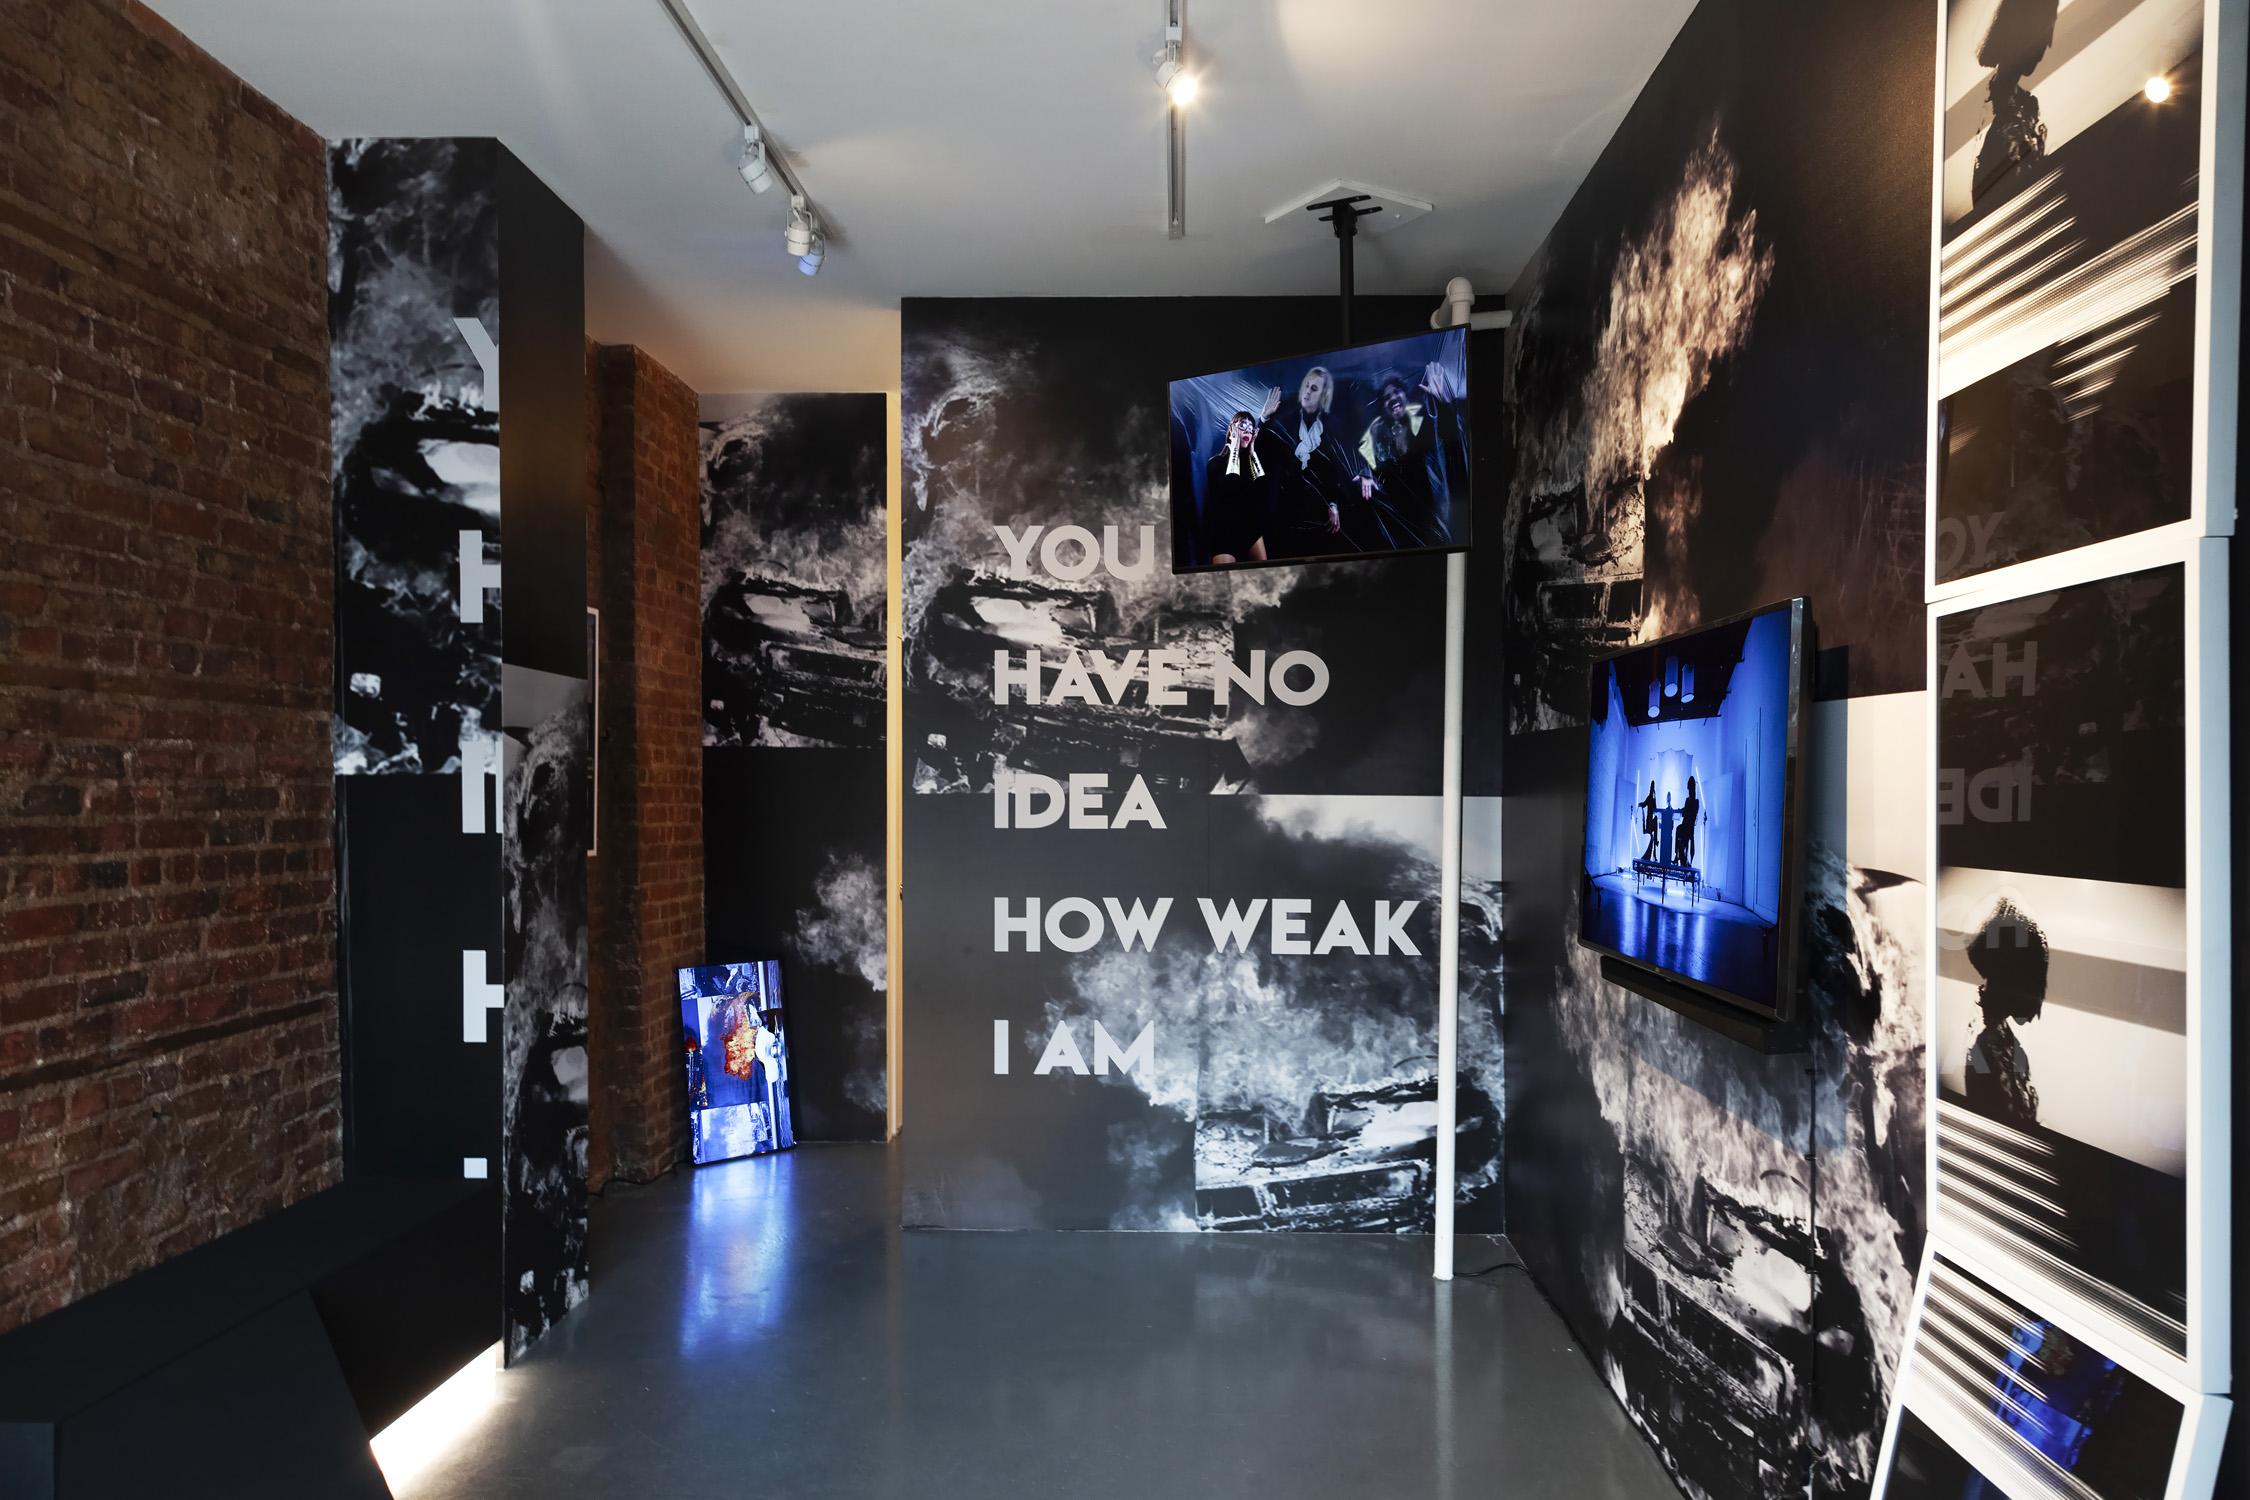 Michelle Handelman,  LOVER HATER CUNTY INTELLECTUAL,  Exhibition View, 4.18.19 - 5.26.19